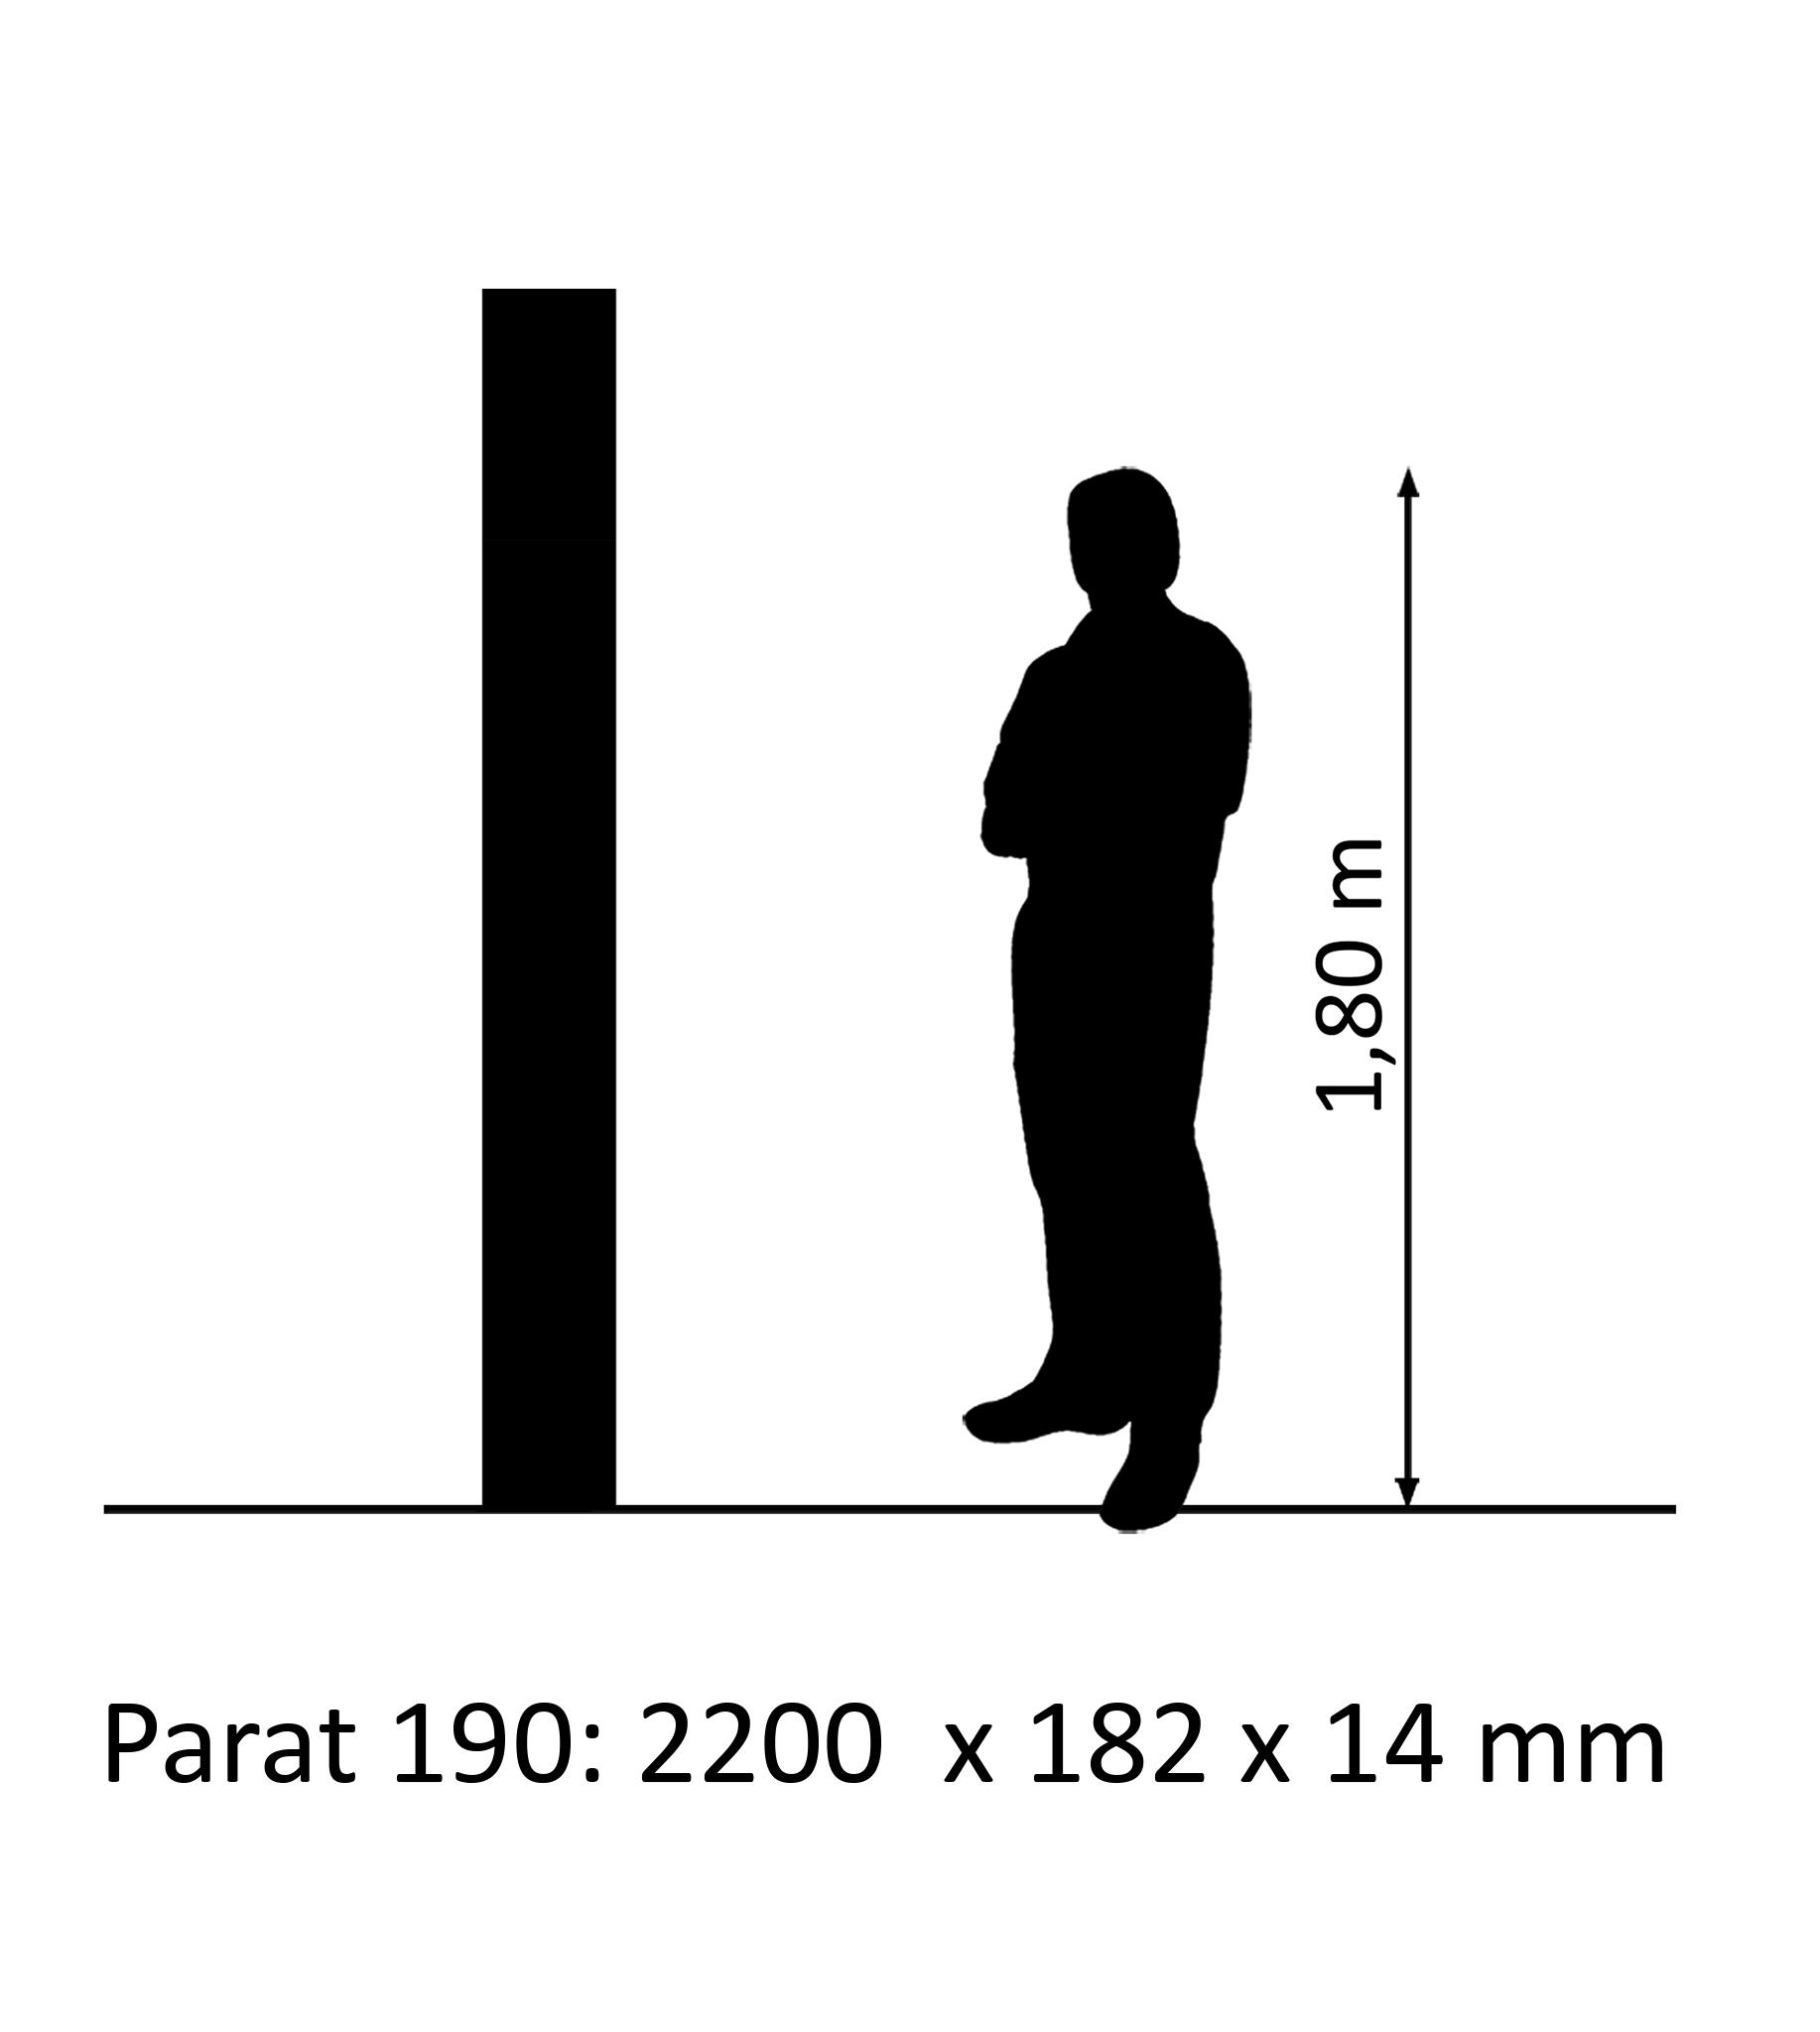 Parat 190 Dub Avantgard SB olej 14mm